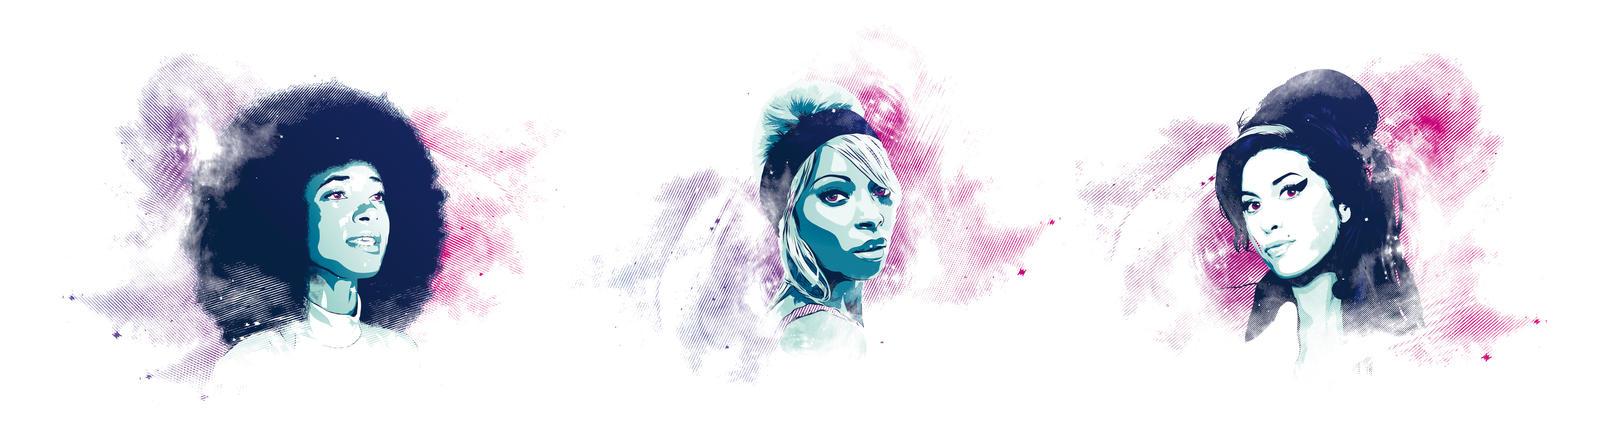 Esperanza Mary J Amy - Vector triptych by Psycool